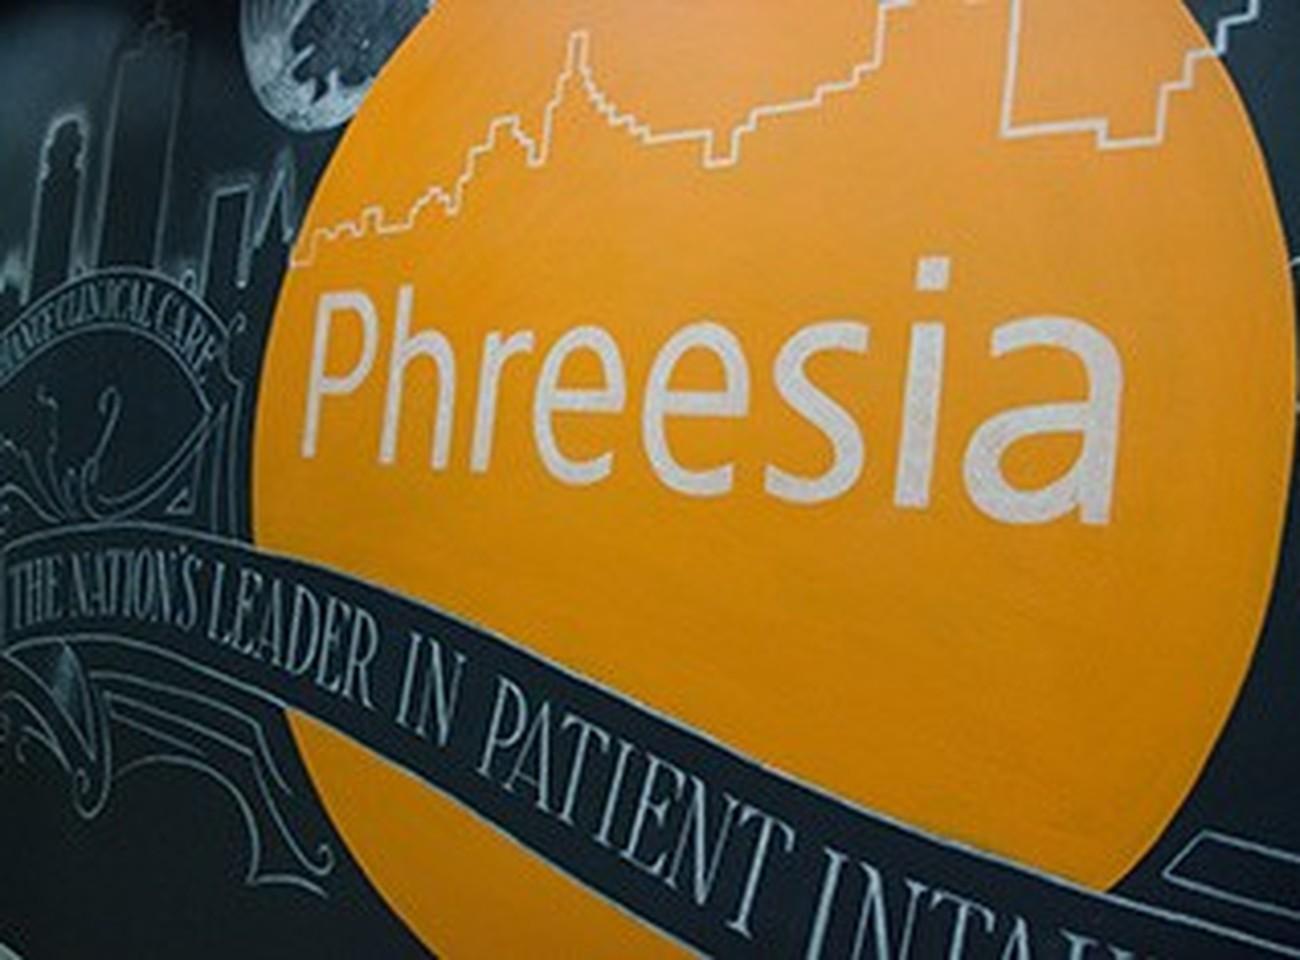 Phreesia Careers